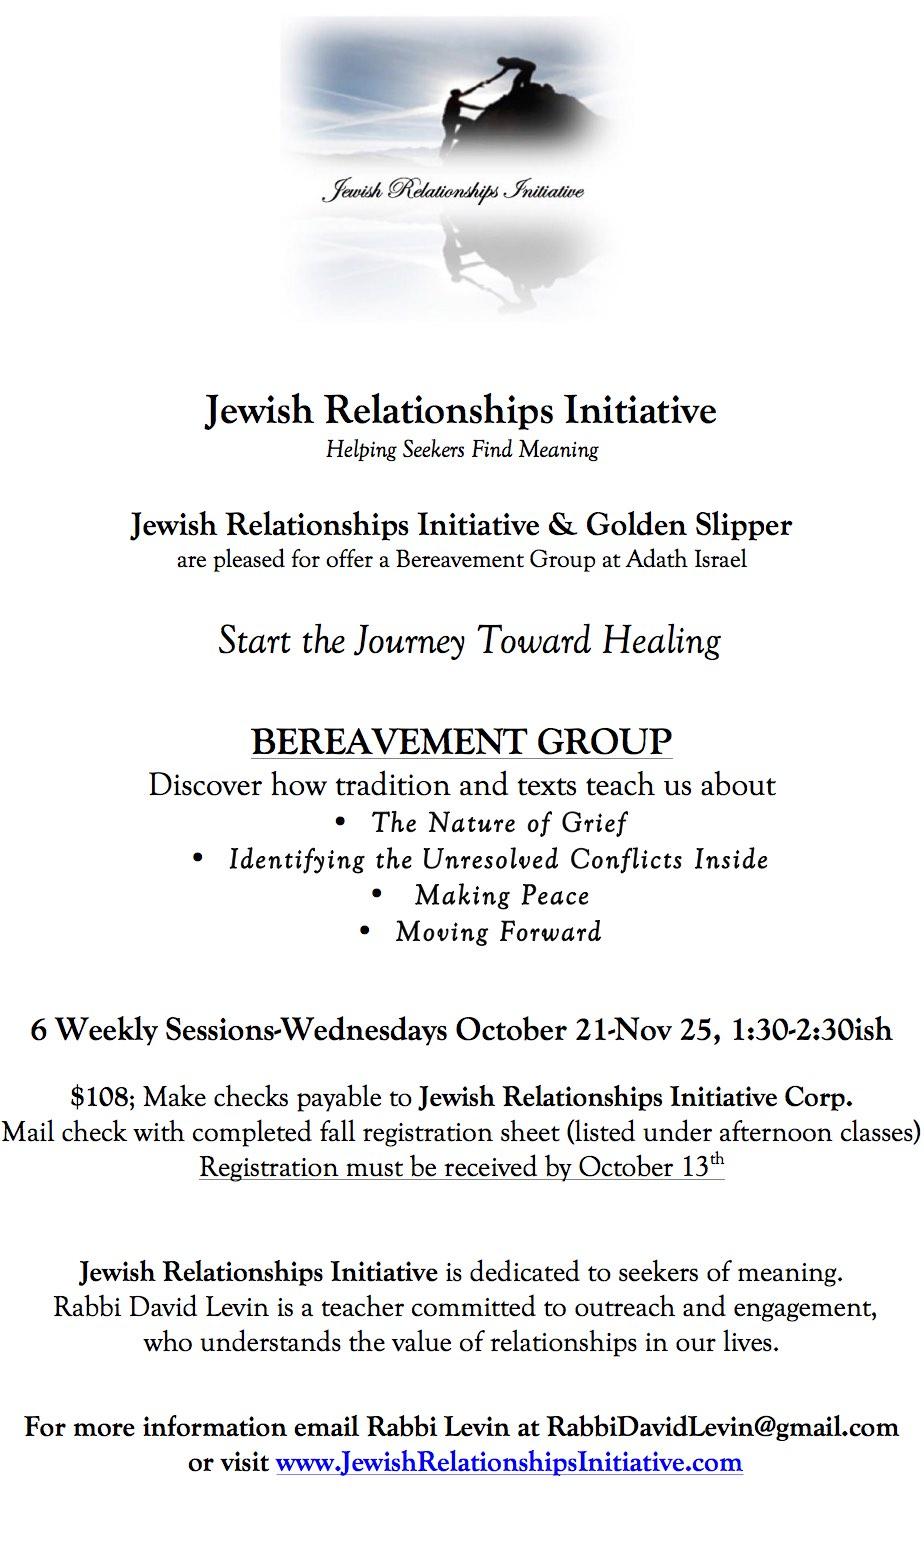 Bereavement group w GS